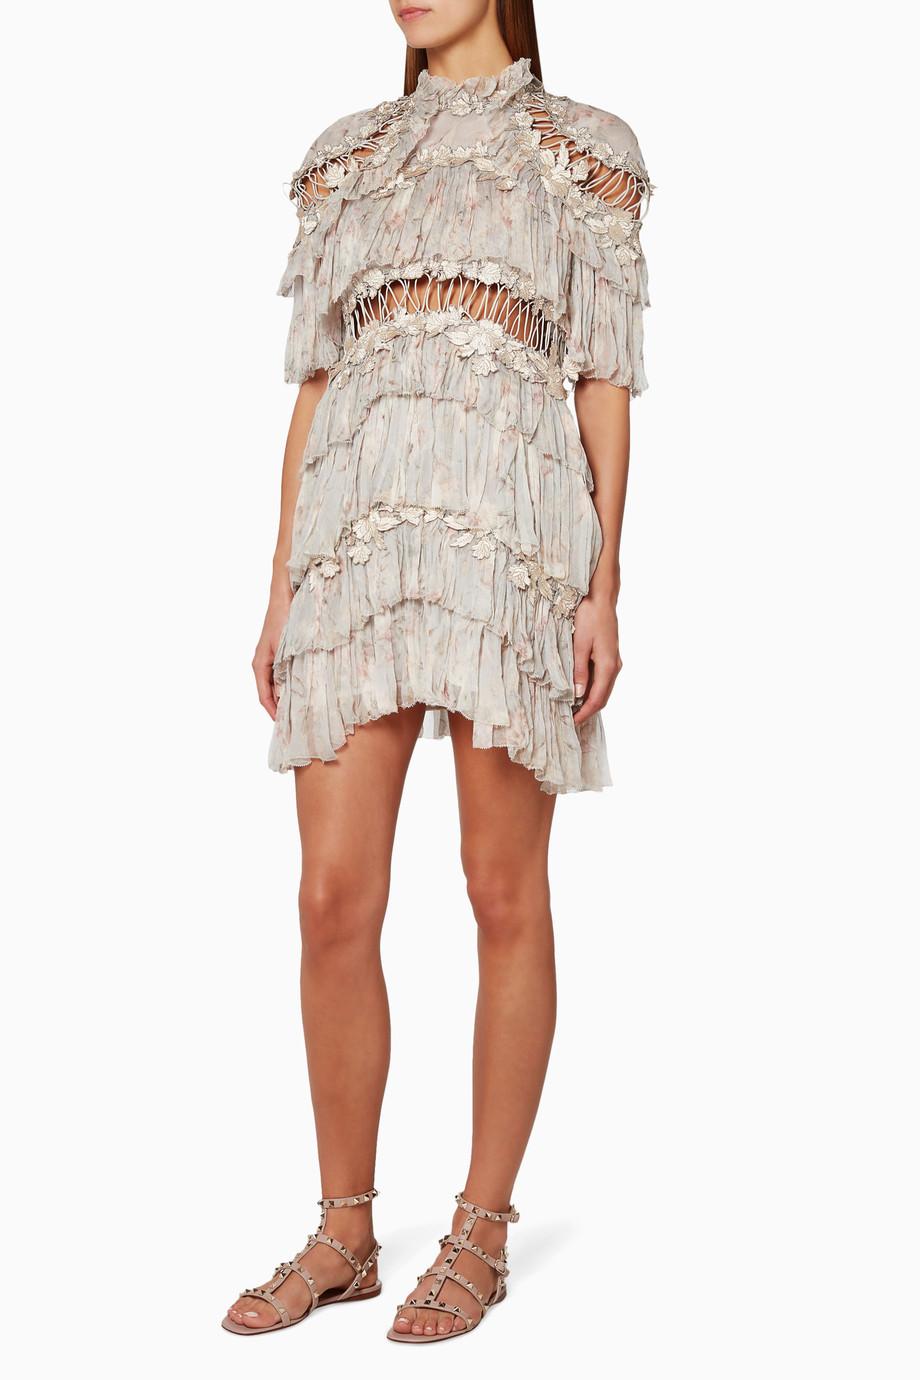 5a03a6da109f Shop Zimmermann Neutral Cream Stranded Tier Mini Dress for Women ...